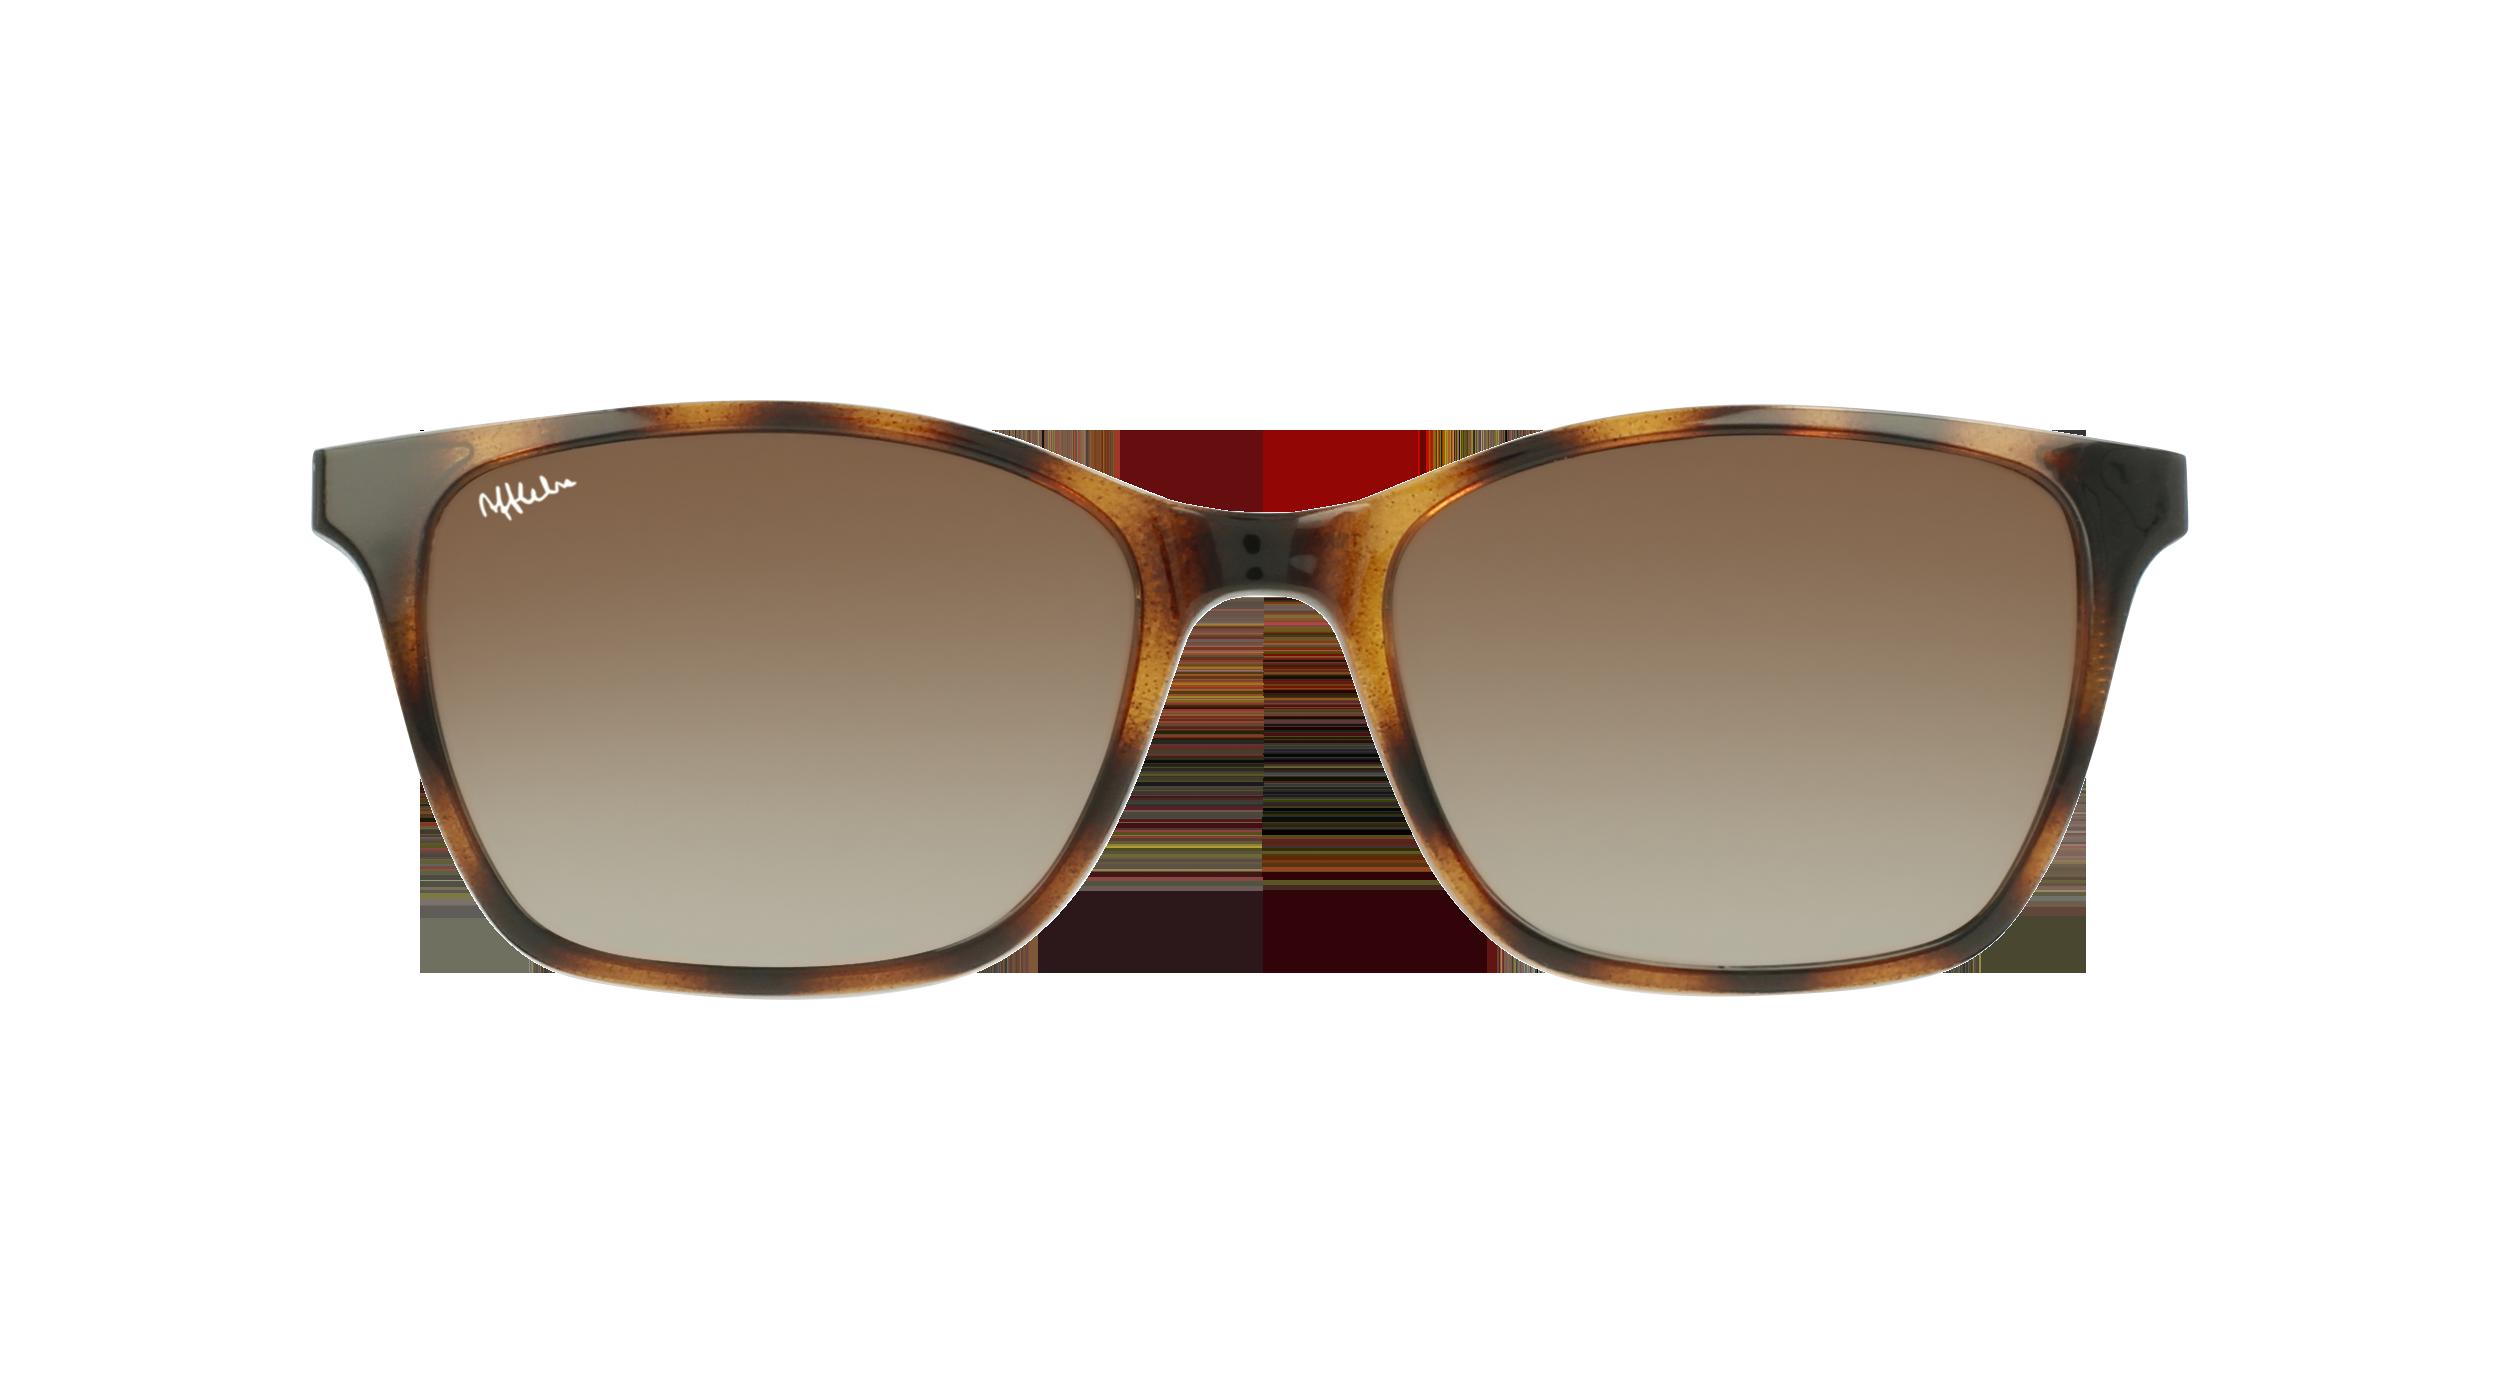 afflelou/france/products/smart_clip/clips_glasses/07630036457573.png